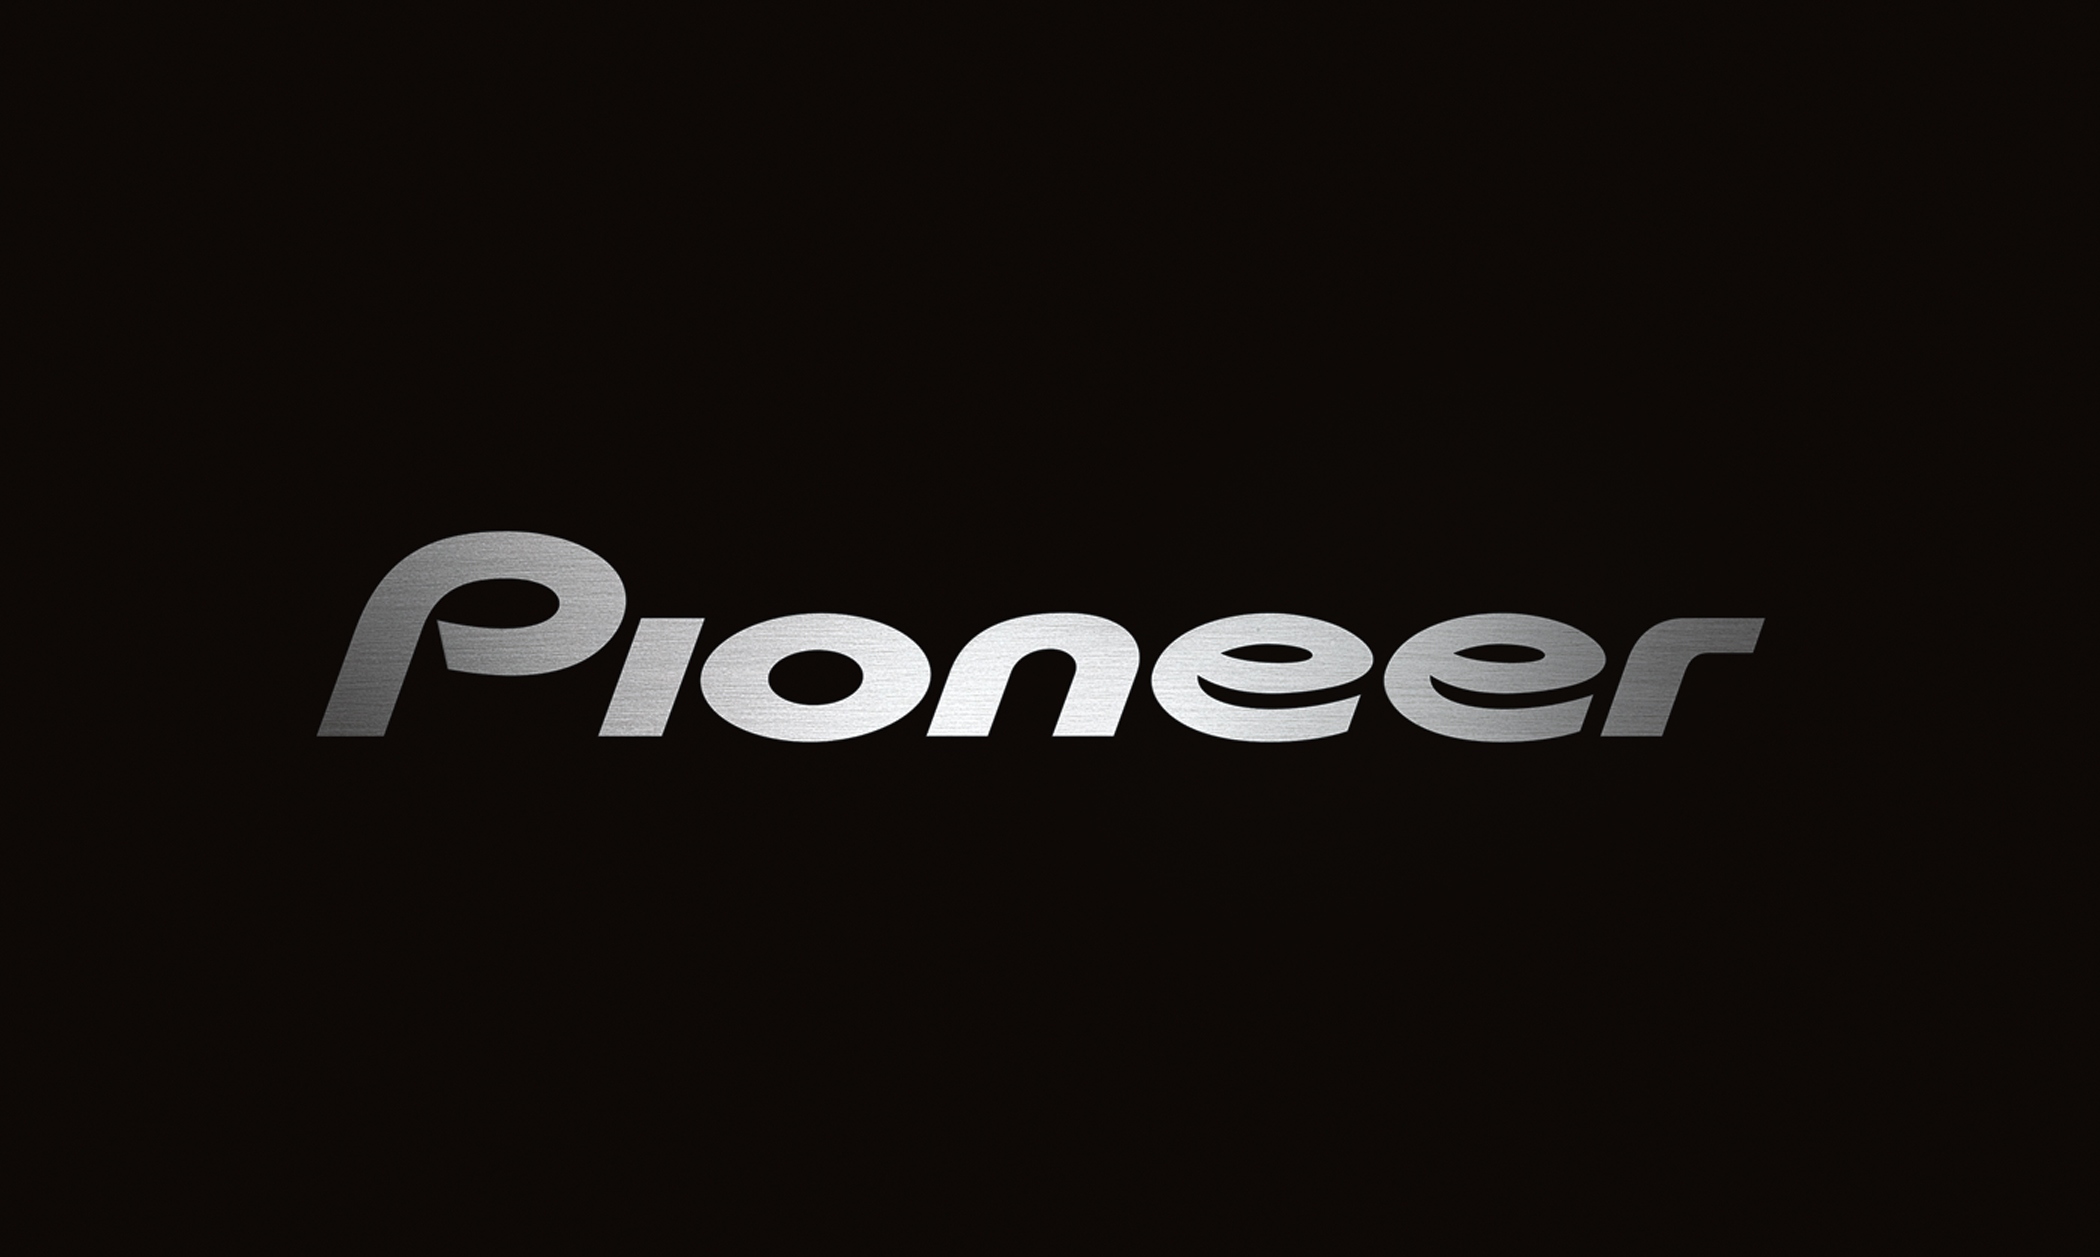 Pioneer Logo Wallpaper